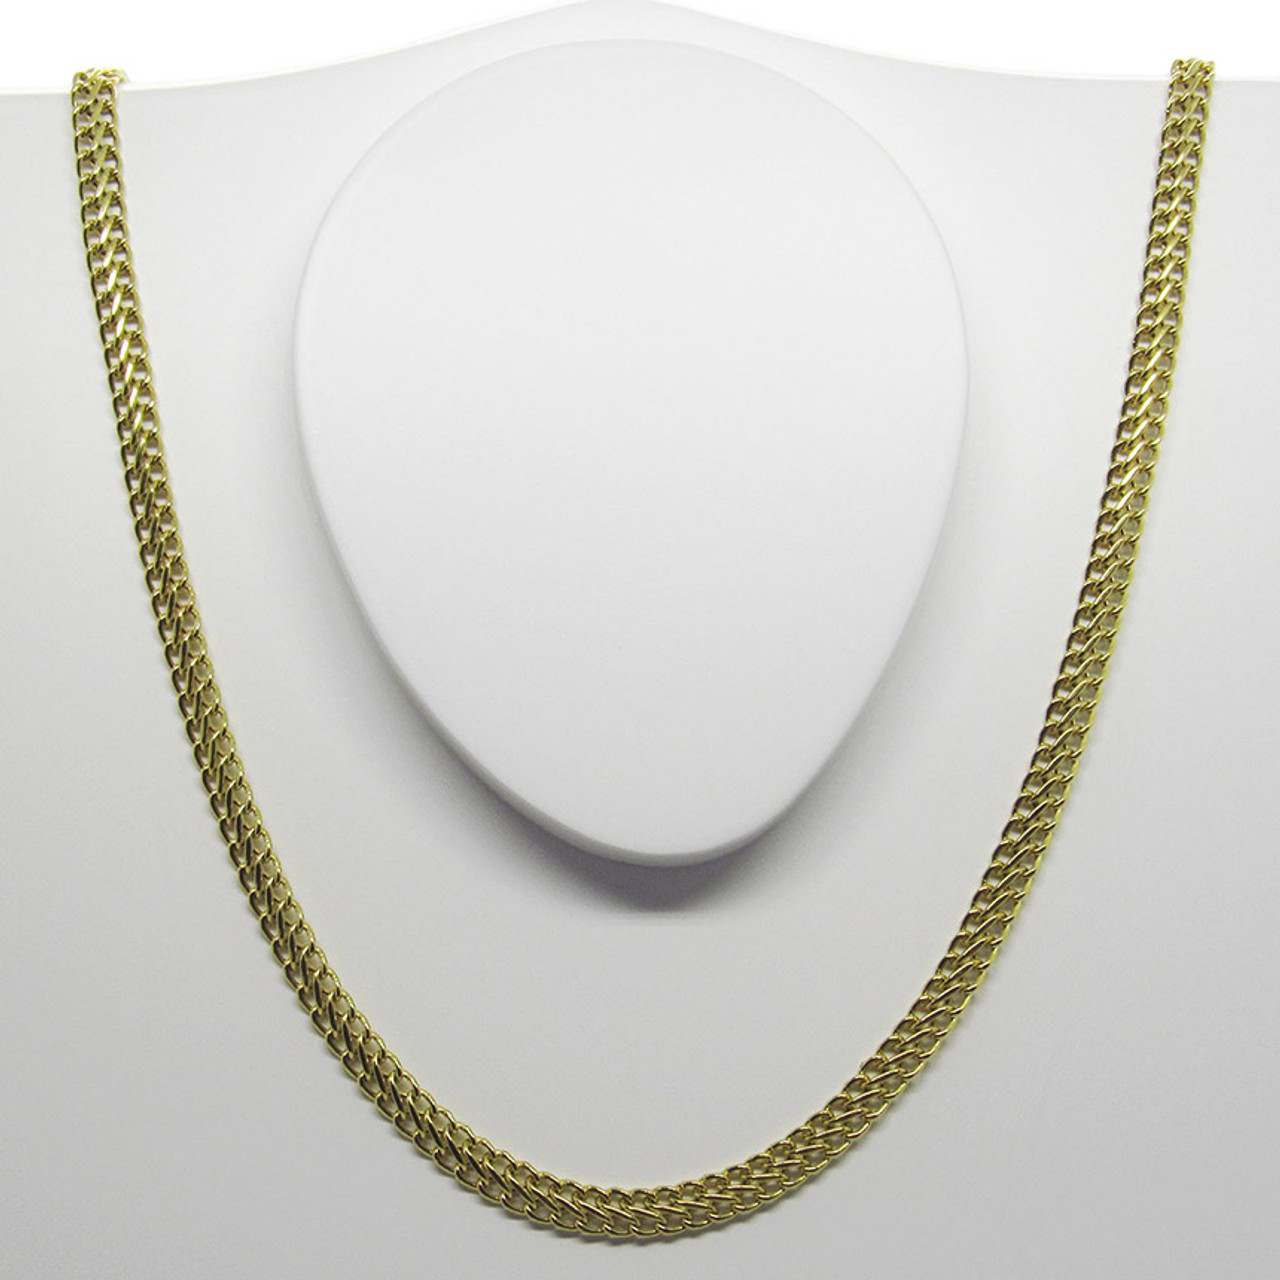 Corrente de ouro 18k Lacraia 4.95mm com 45cm (CJCO-00000380) 359cce723b